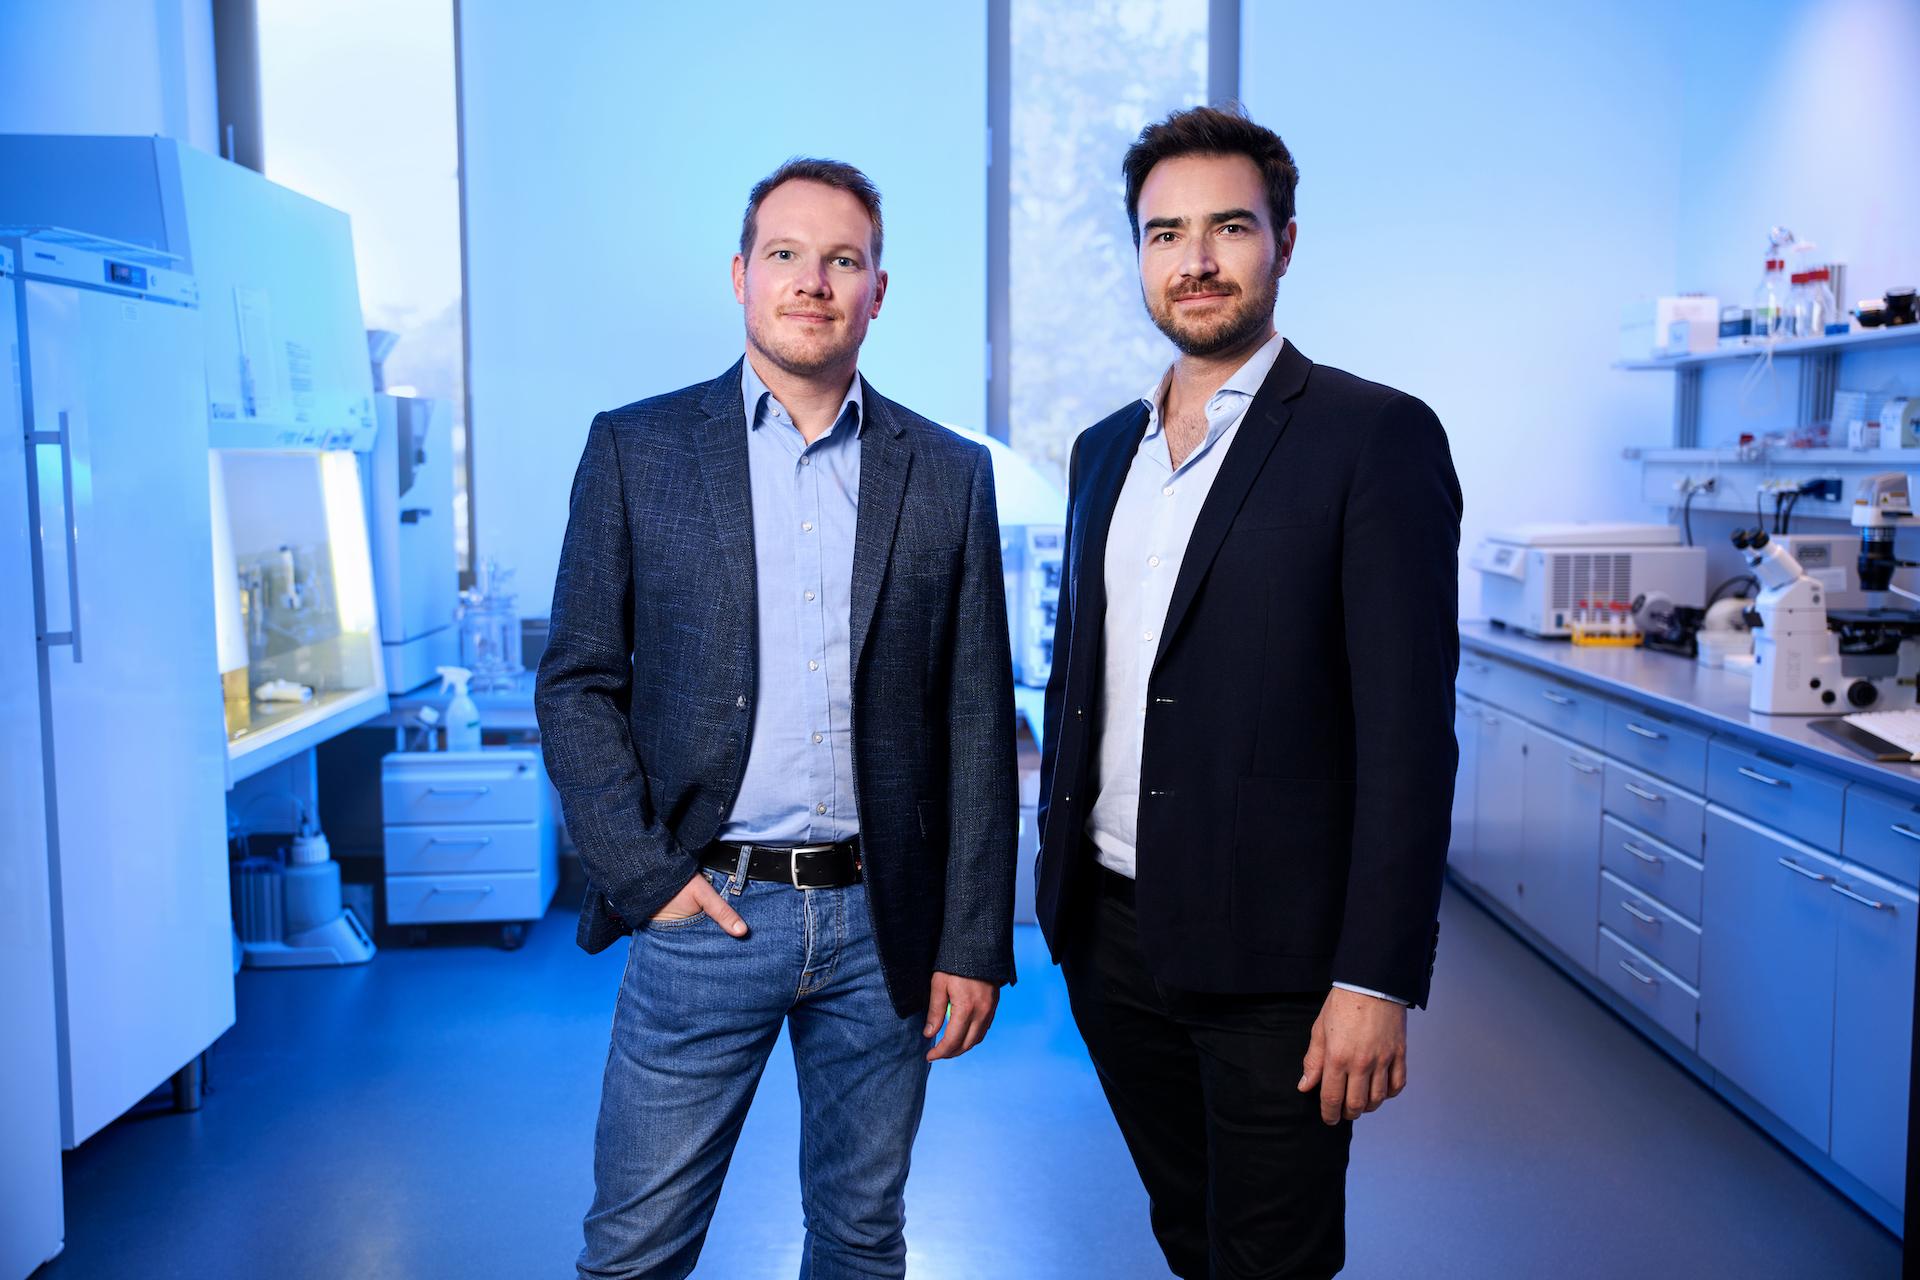 bioreactor technologies